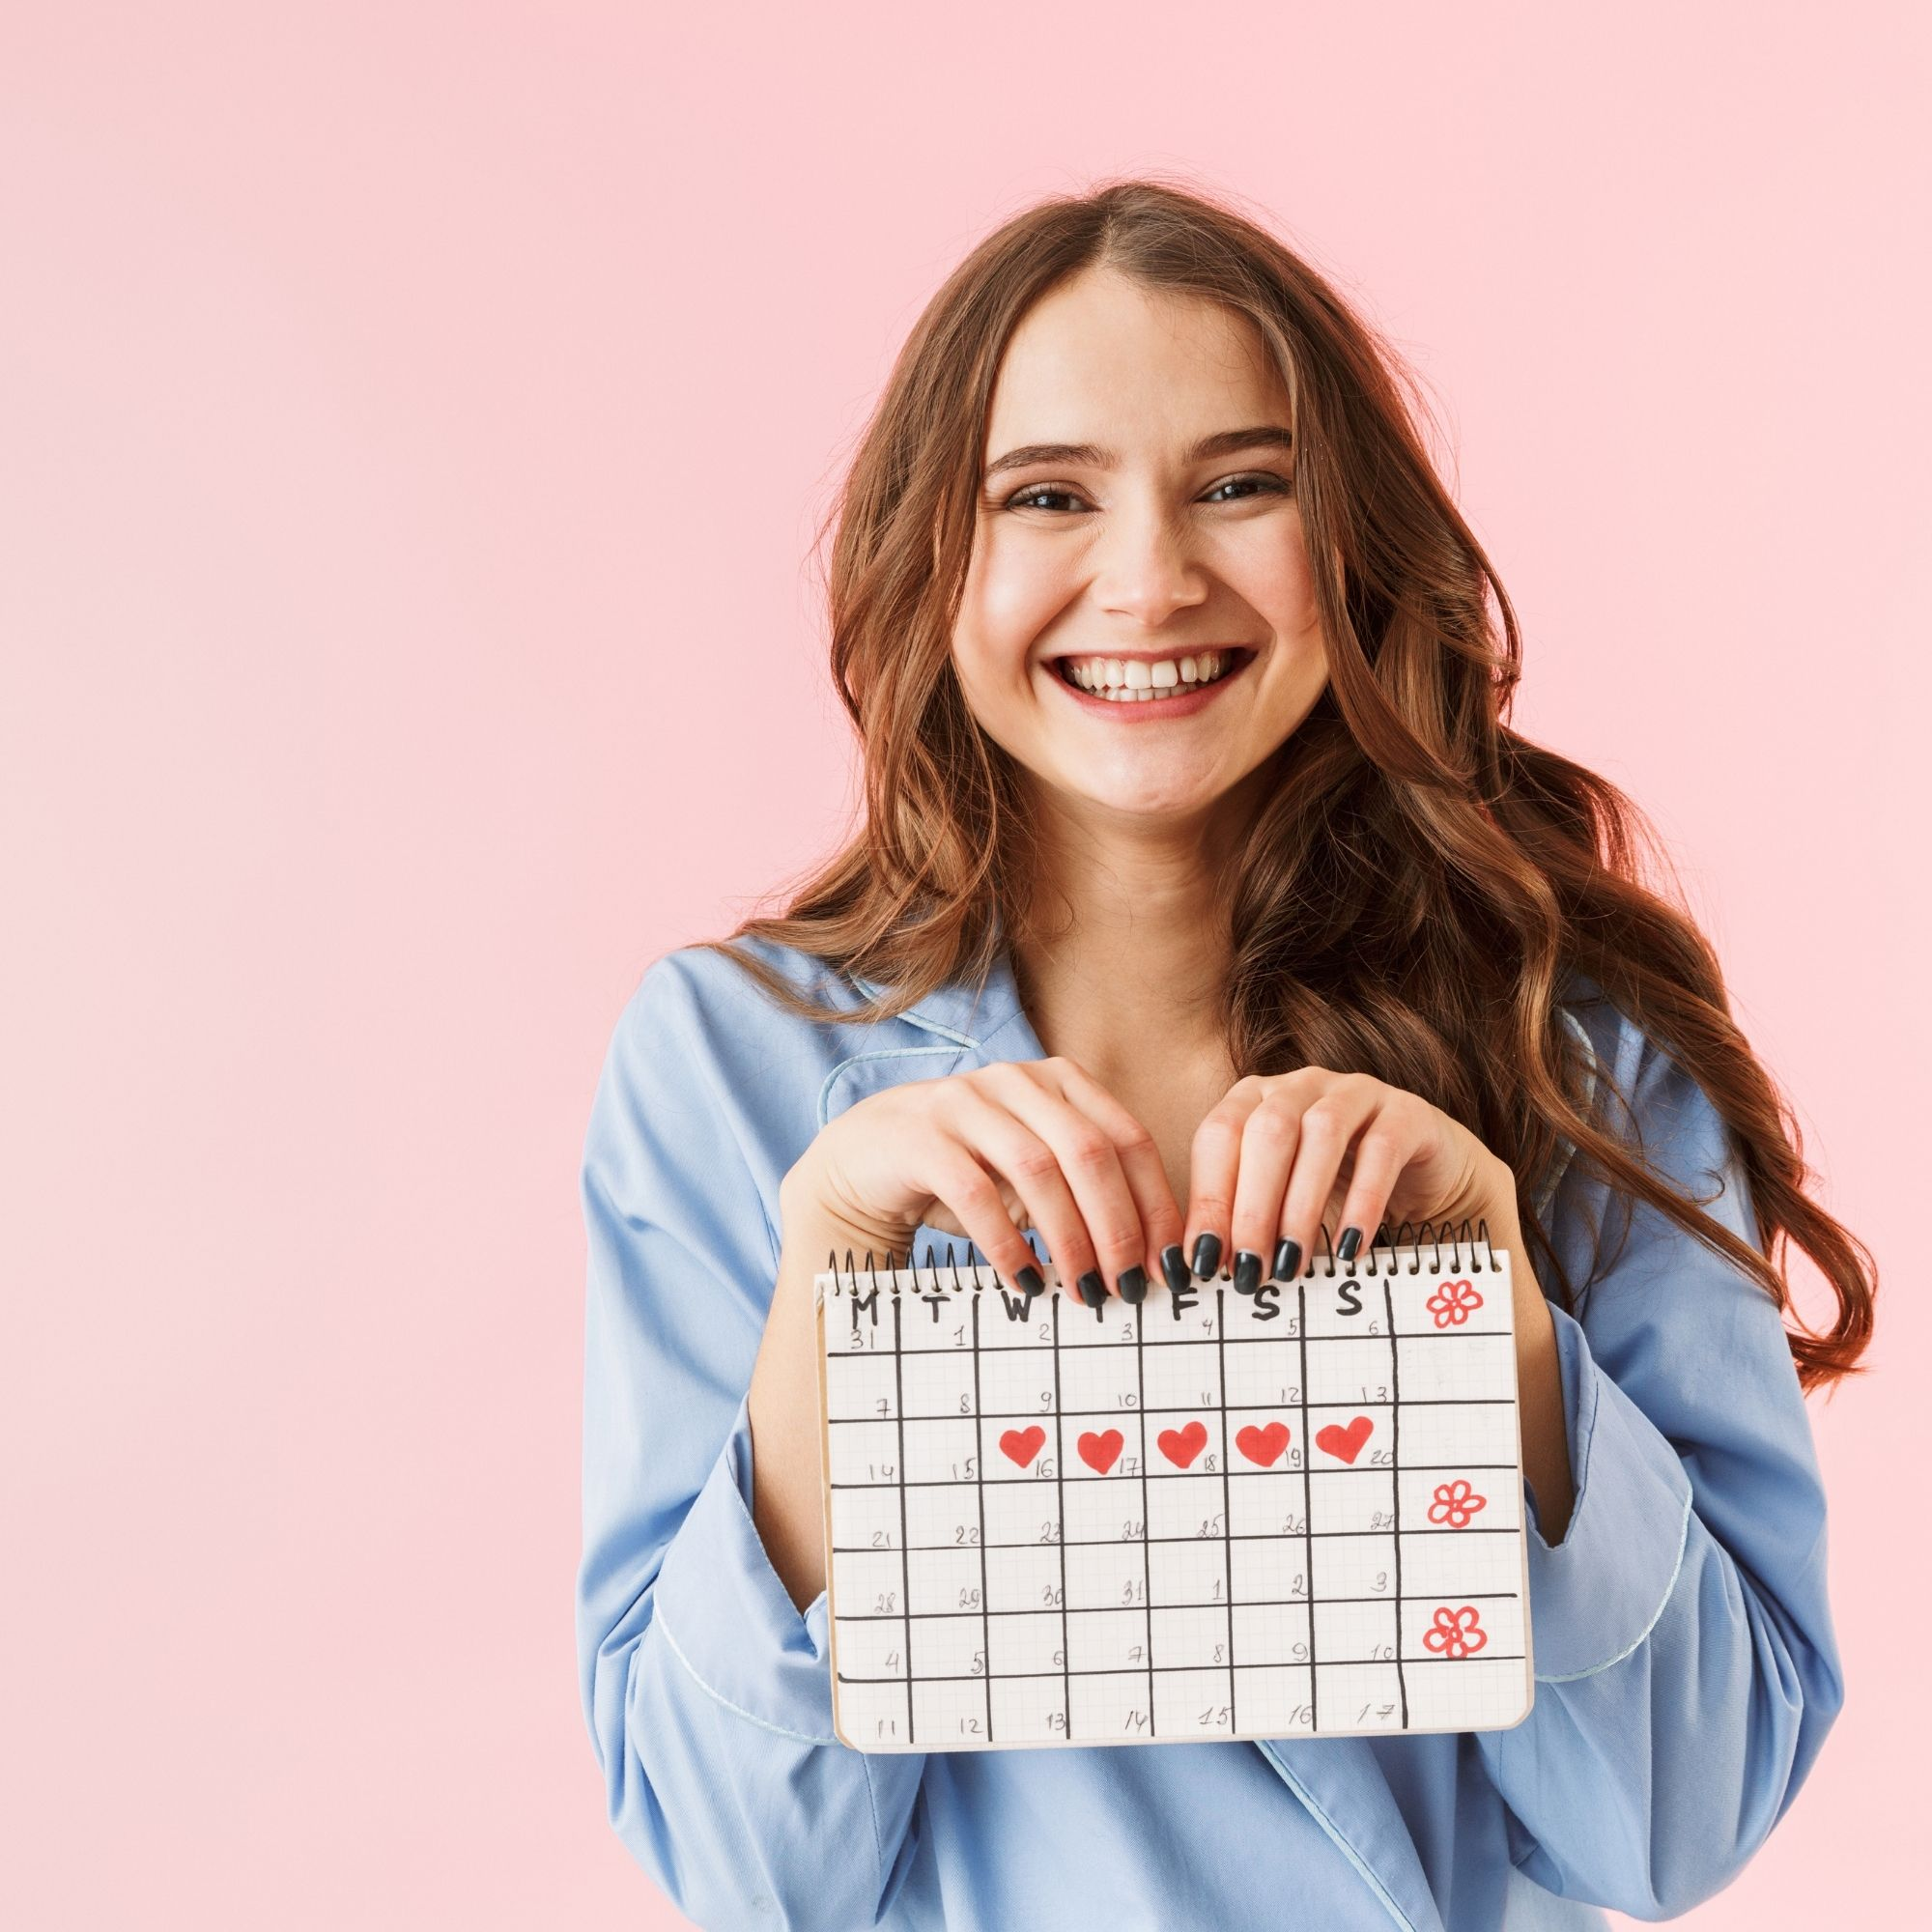 girl with calendar